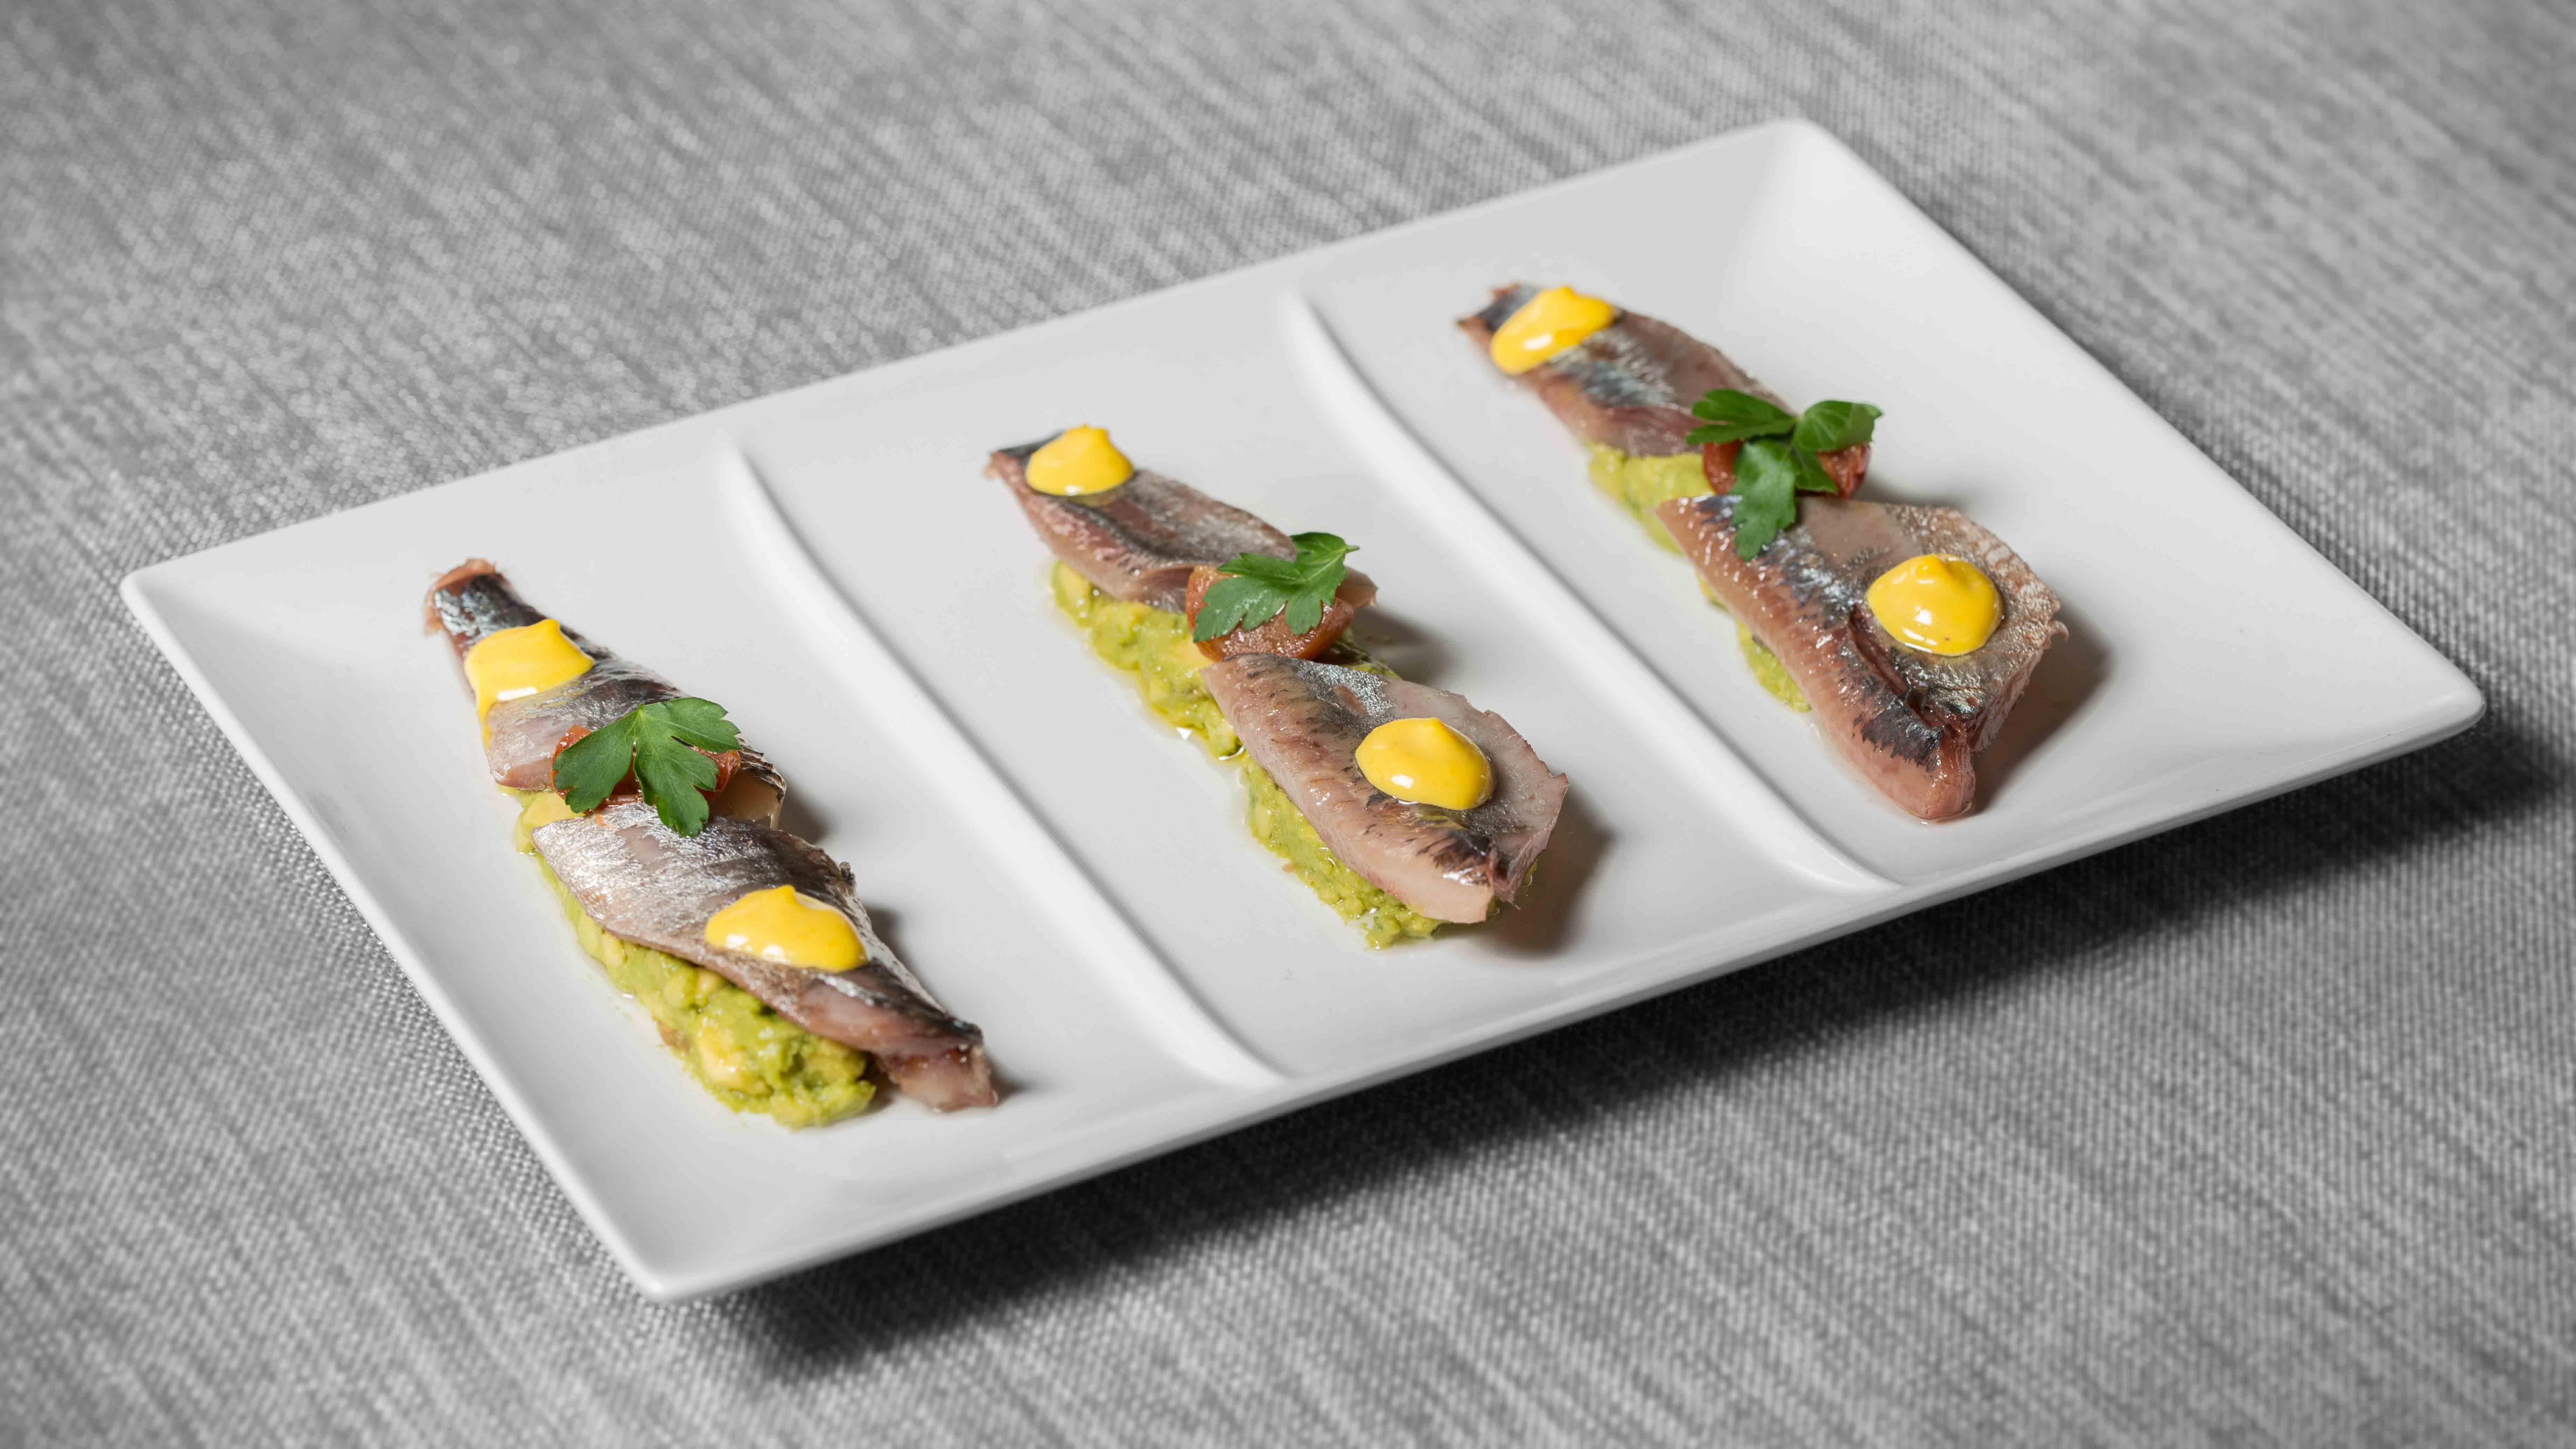 Montes de Galicia explica 8 curiosidades sobre la dieta escandinava